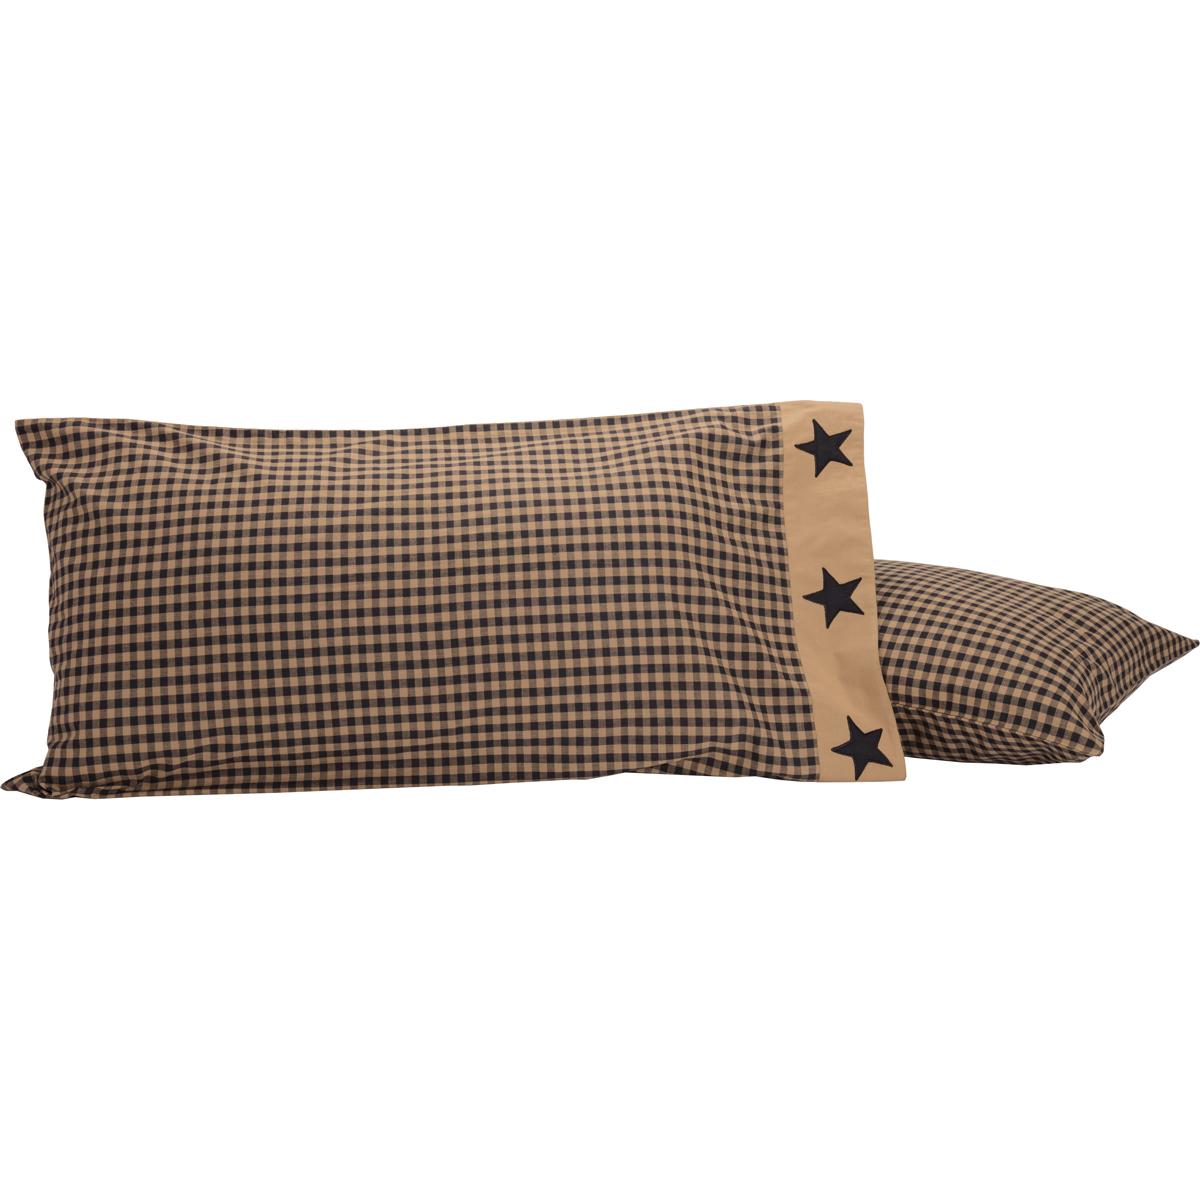 Black Check Star King Pillow Case Set of 2 21x40